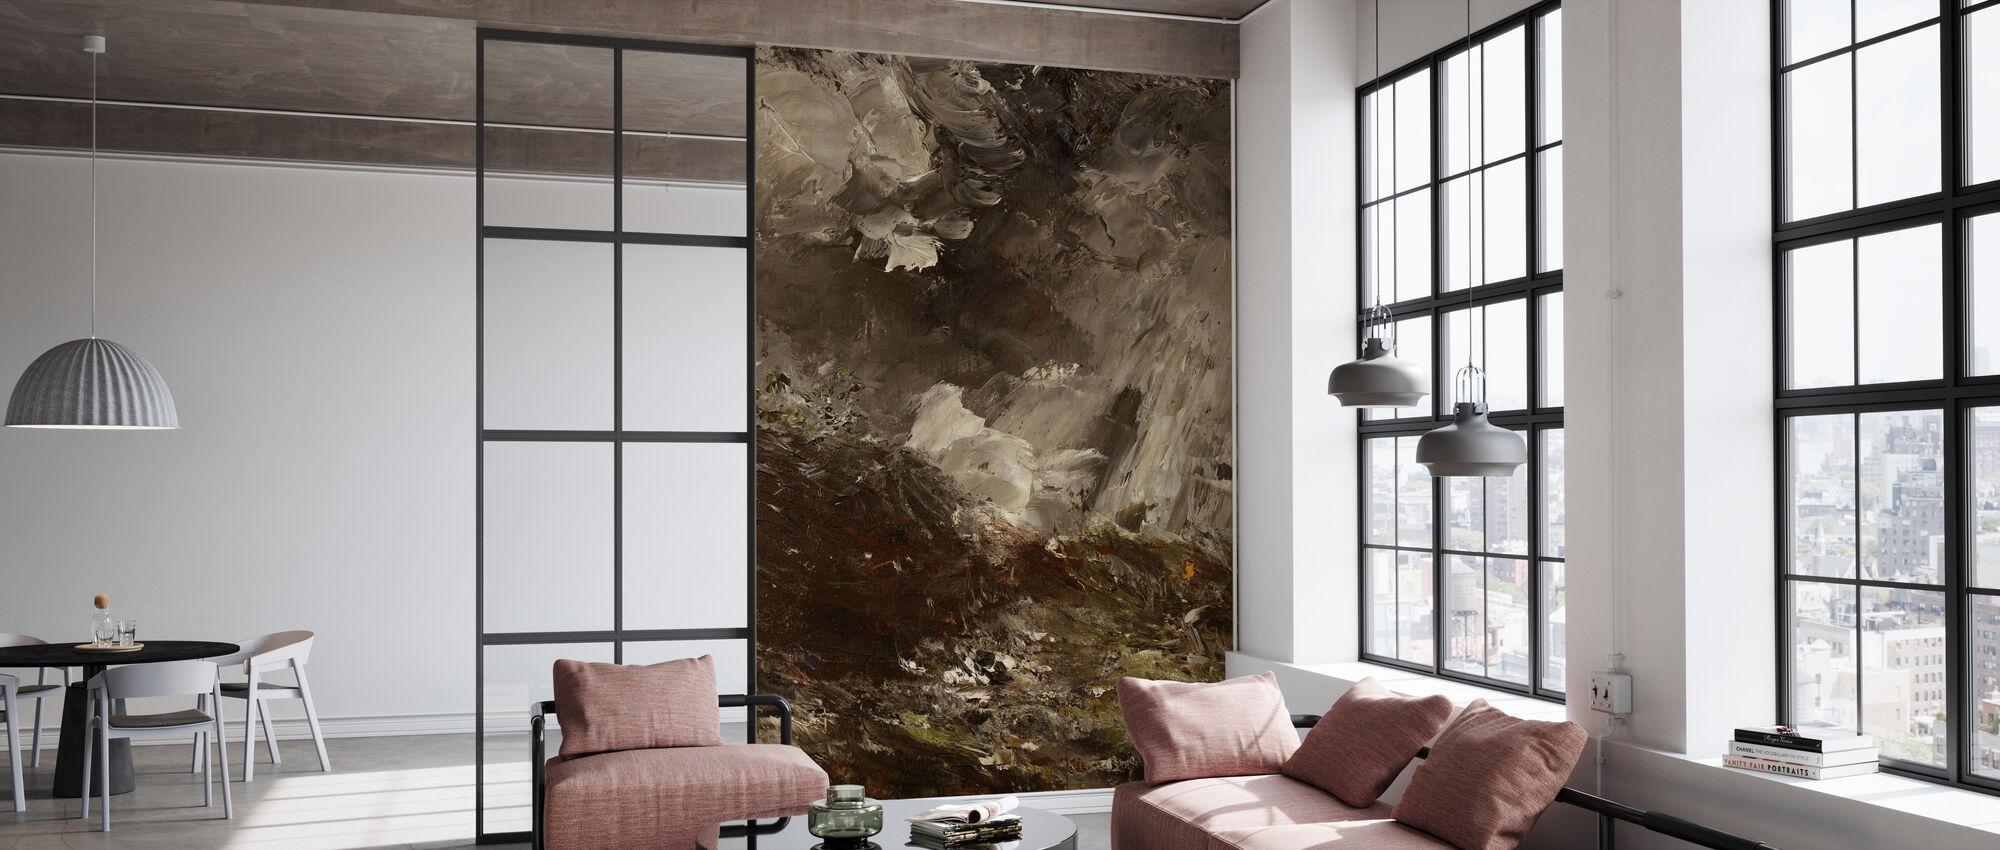 Night of jealousy, August Strindberg - Wallpaper - Office